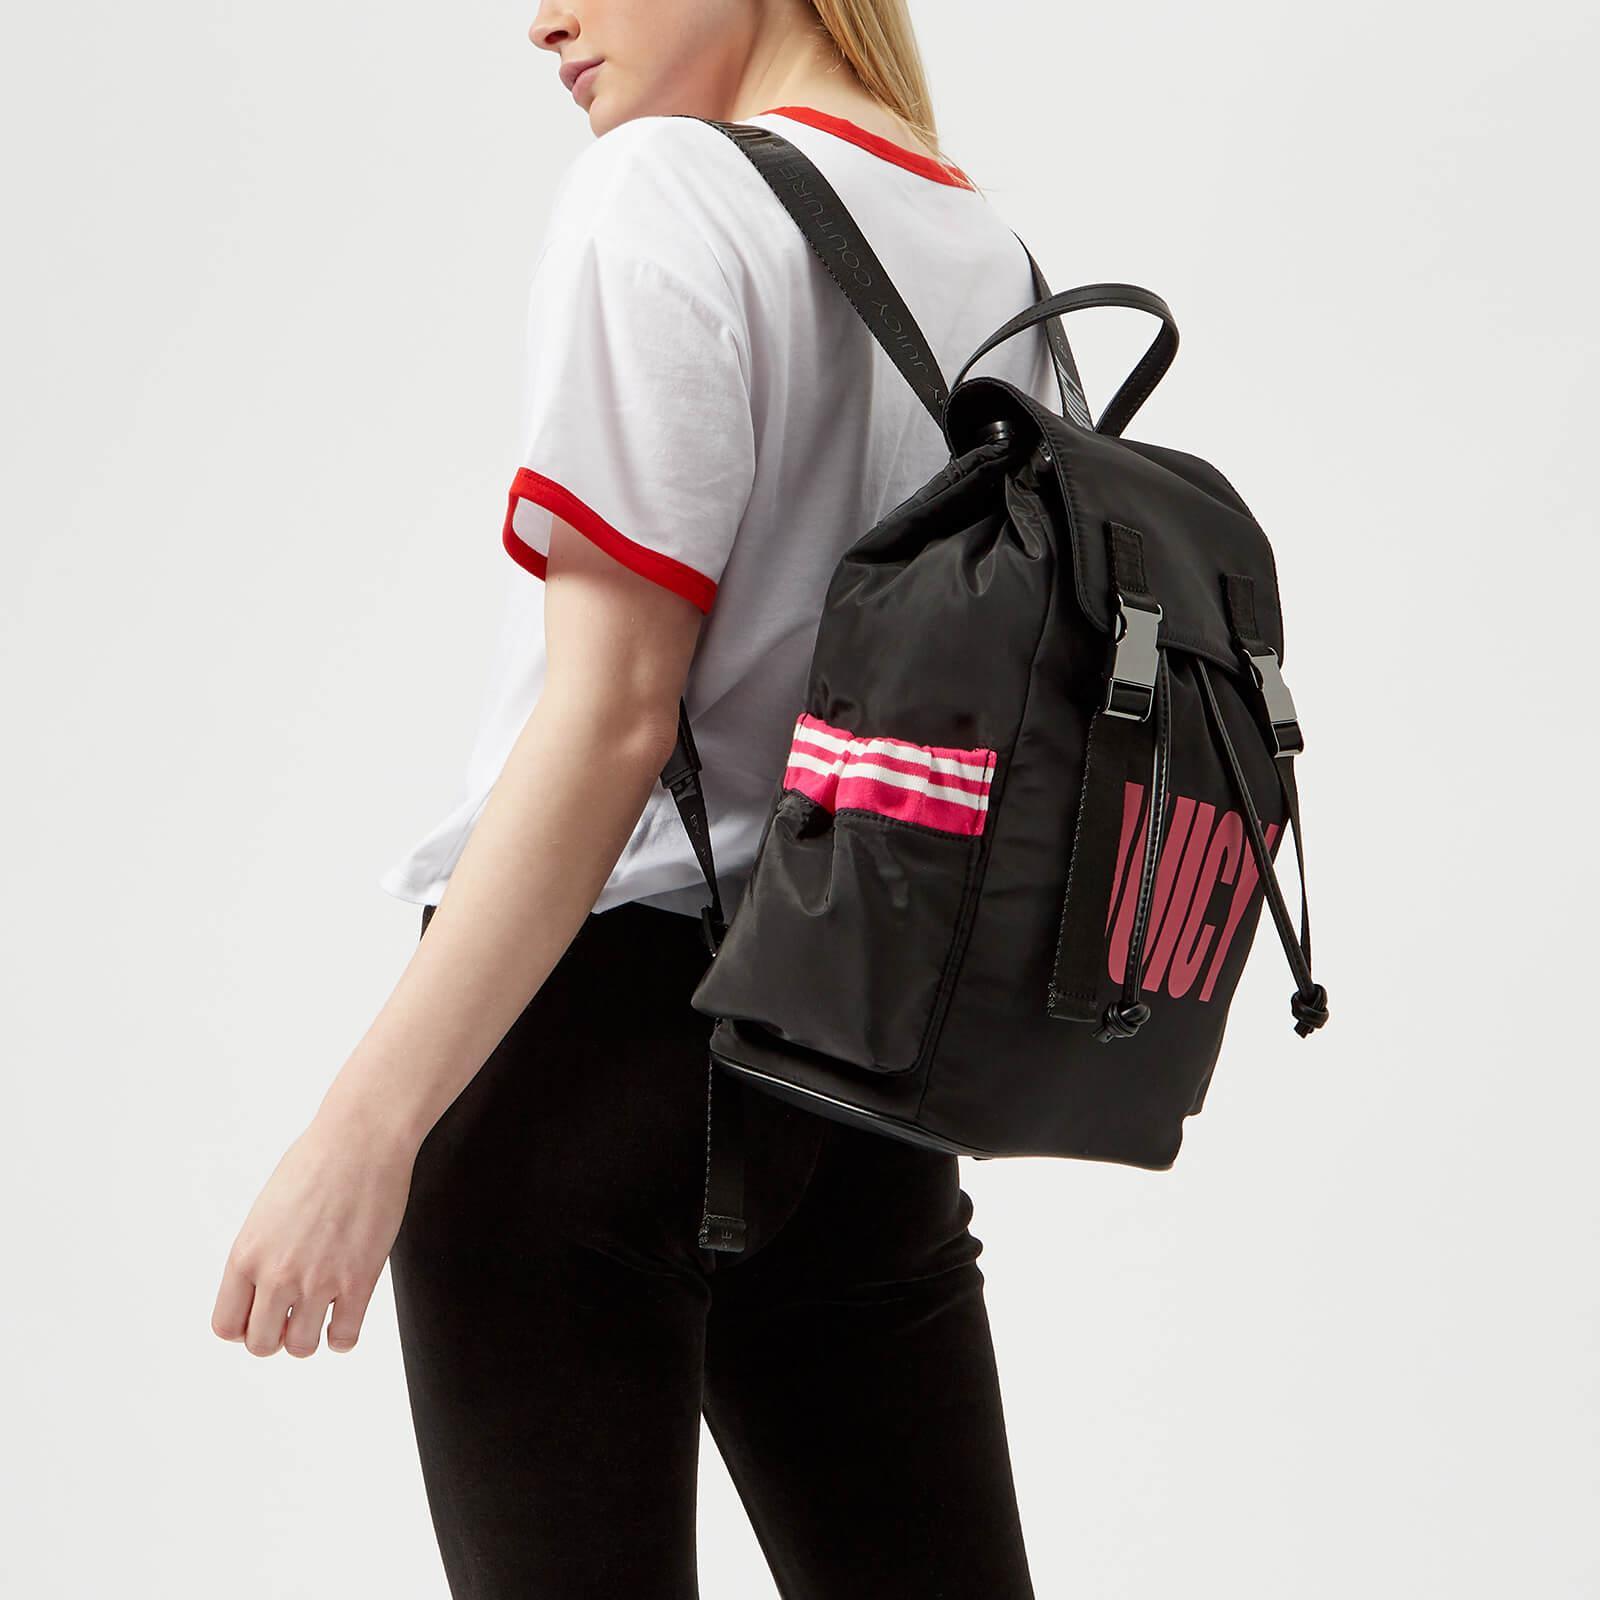 7ec9f1fa11fc Juicy Couture Kinney Multi Pocket Backpack - Lyst